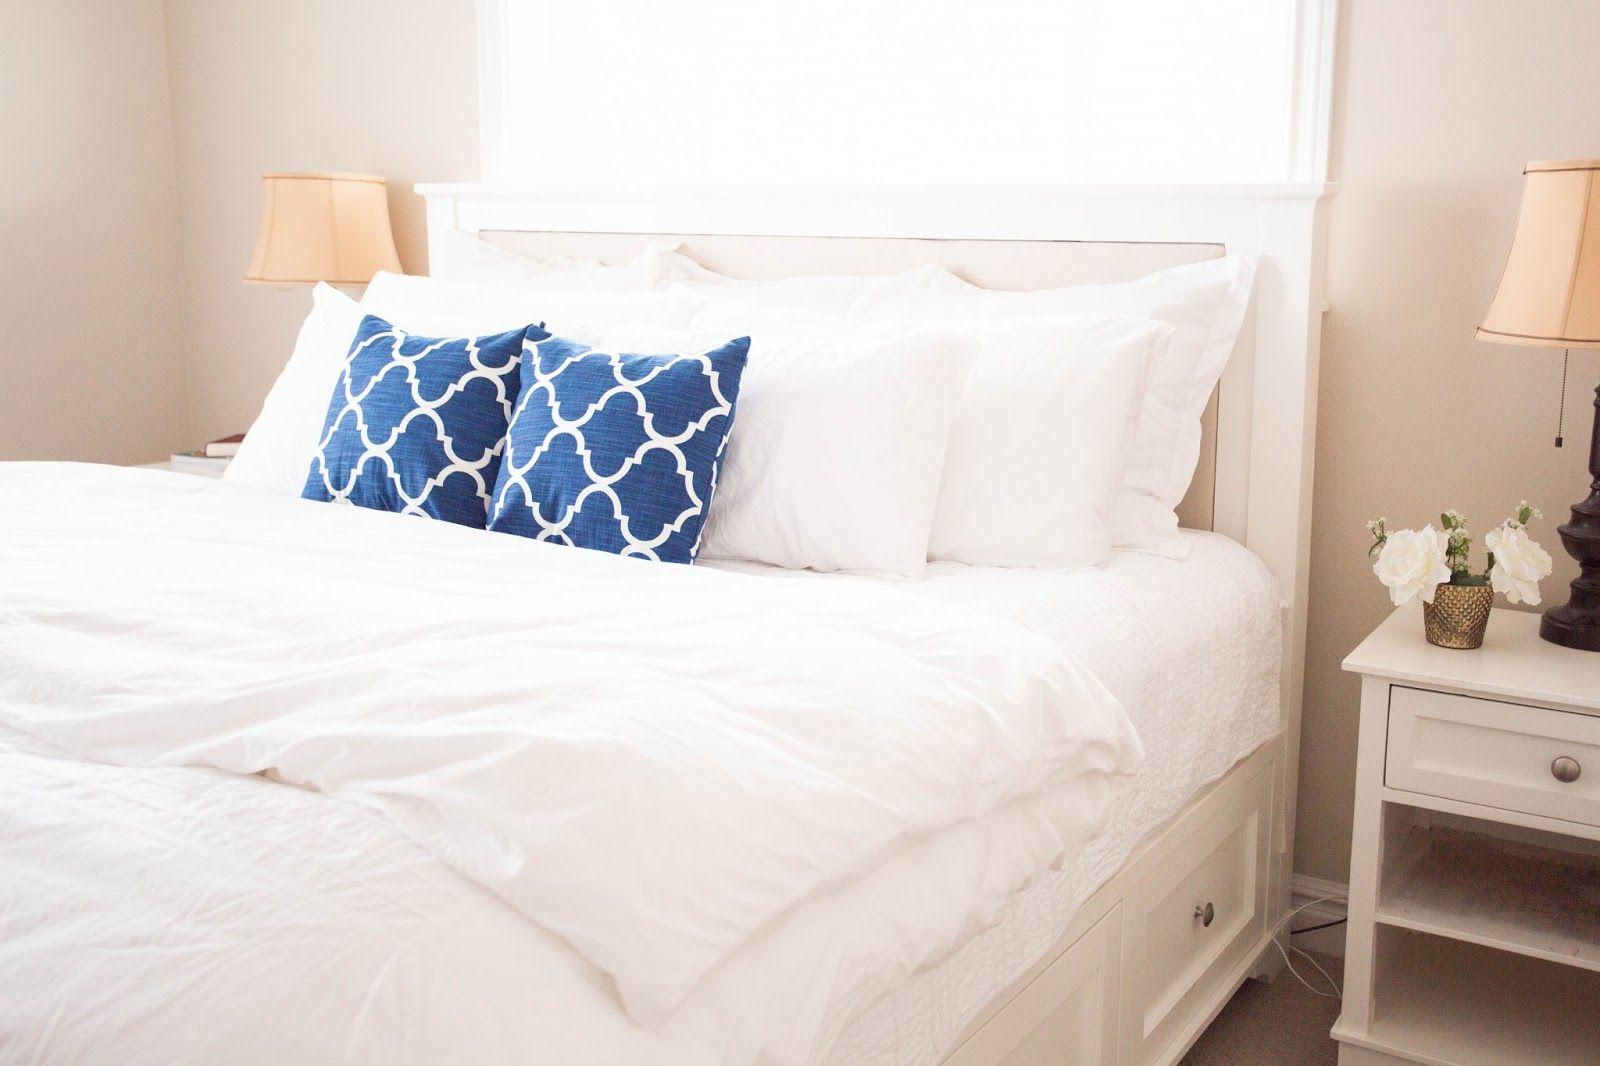 A platform bed with blue pillows